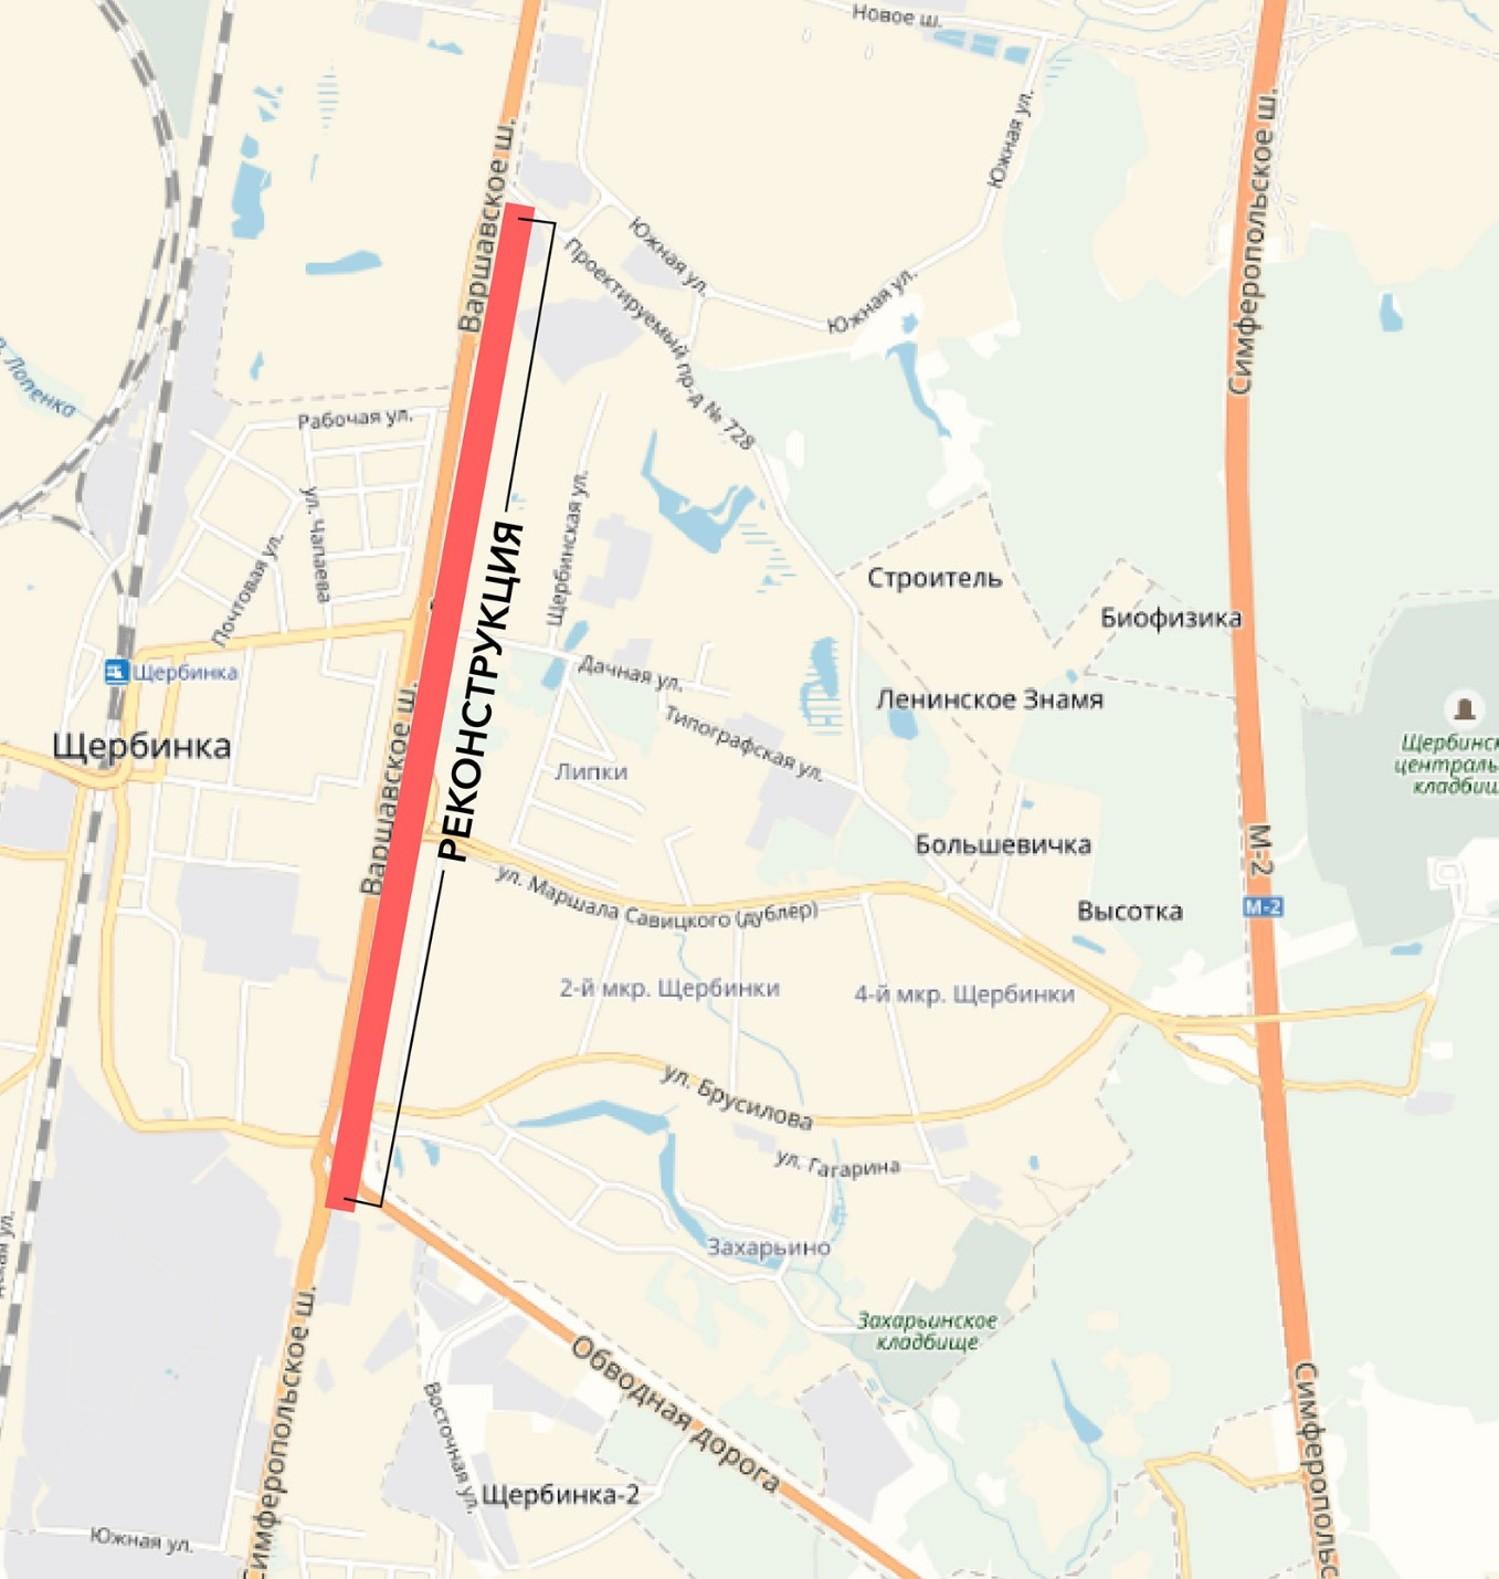 Реконструкция Варшавского шоссе. Фото: www.stroi.mos.ru